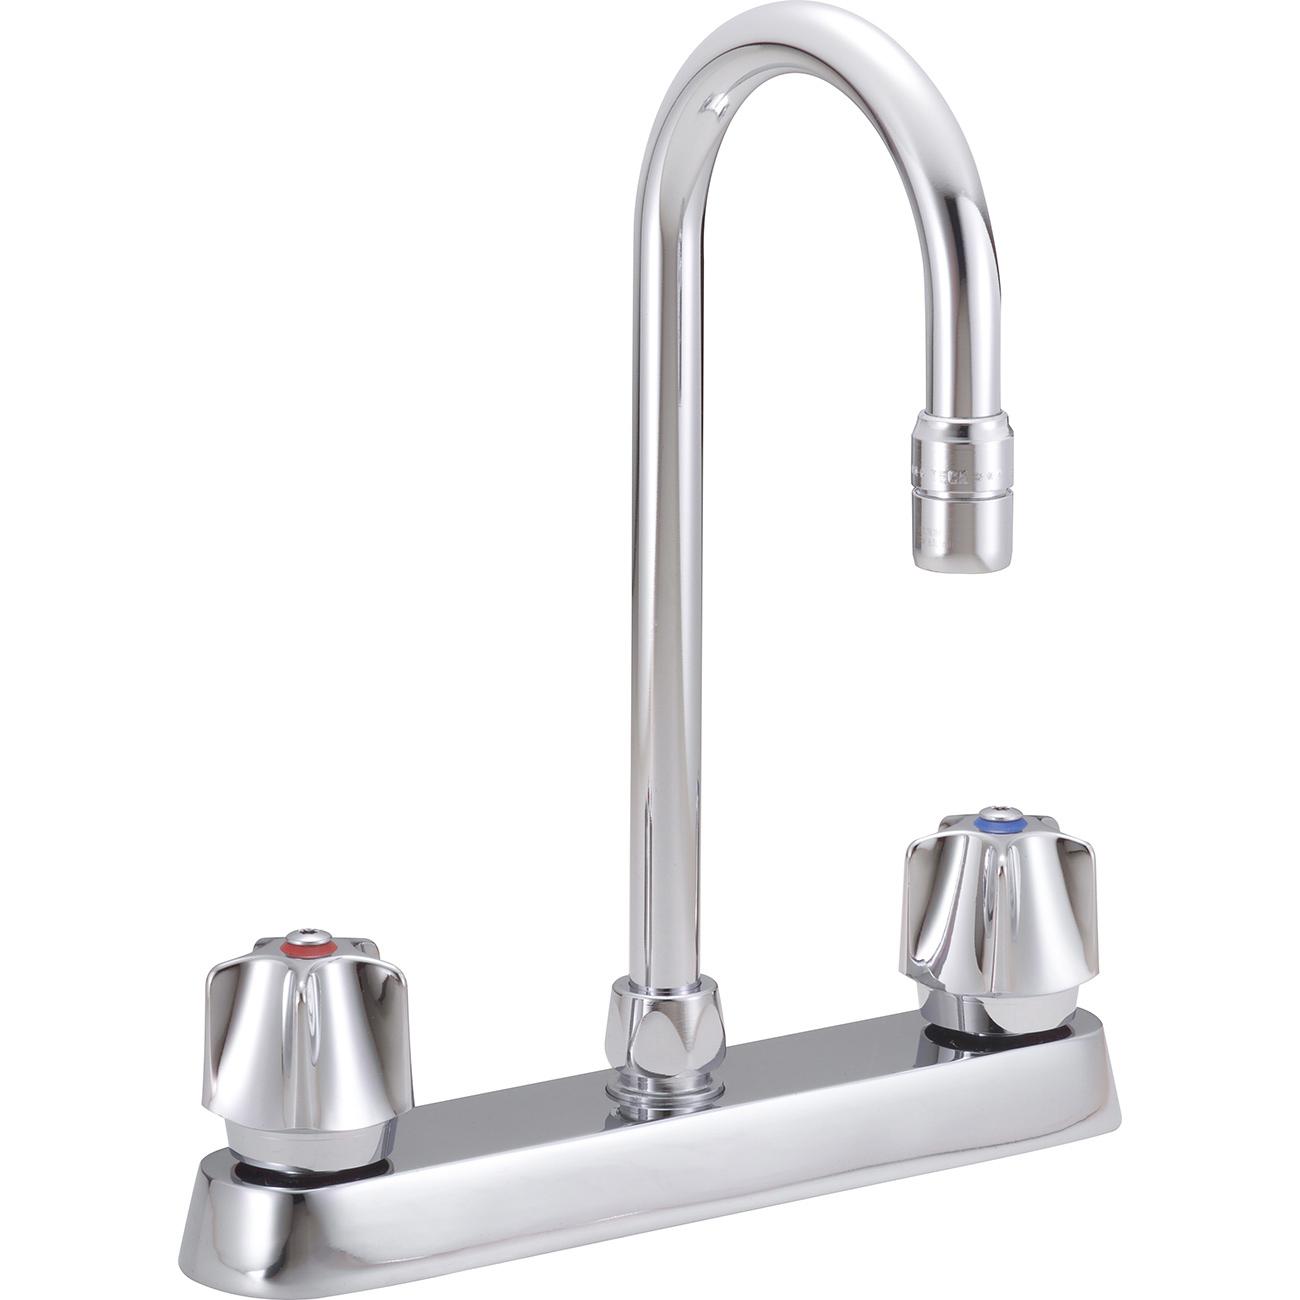 Bath4All - Delta 26c3931 1.5GPM Ceramic Disc Kitchen Faucet with ...